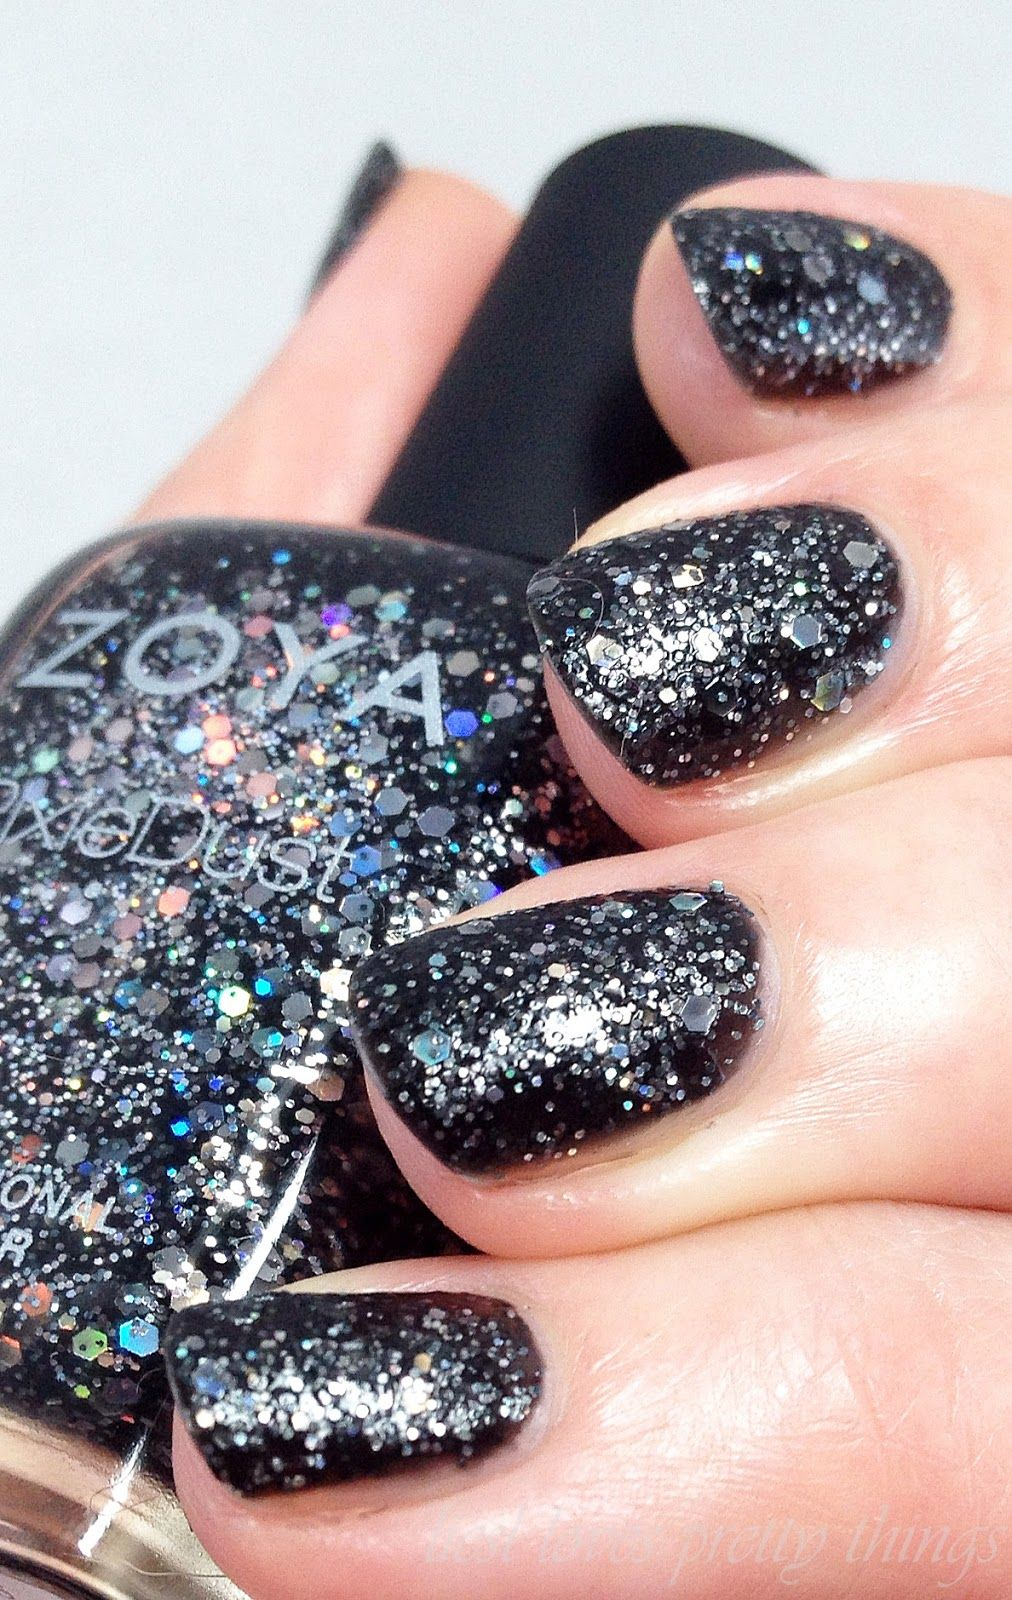 Zoya Imogen #zoyanailpolish | NAILS | Pinterest | Nail nail, Makeup ...